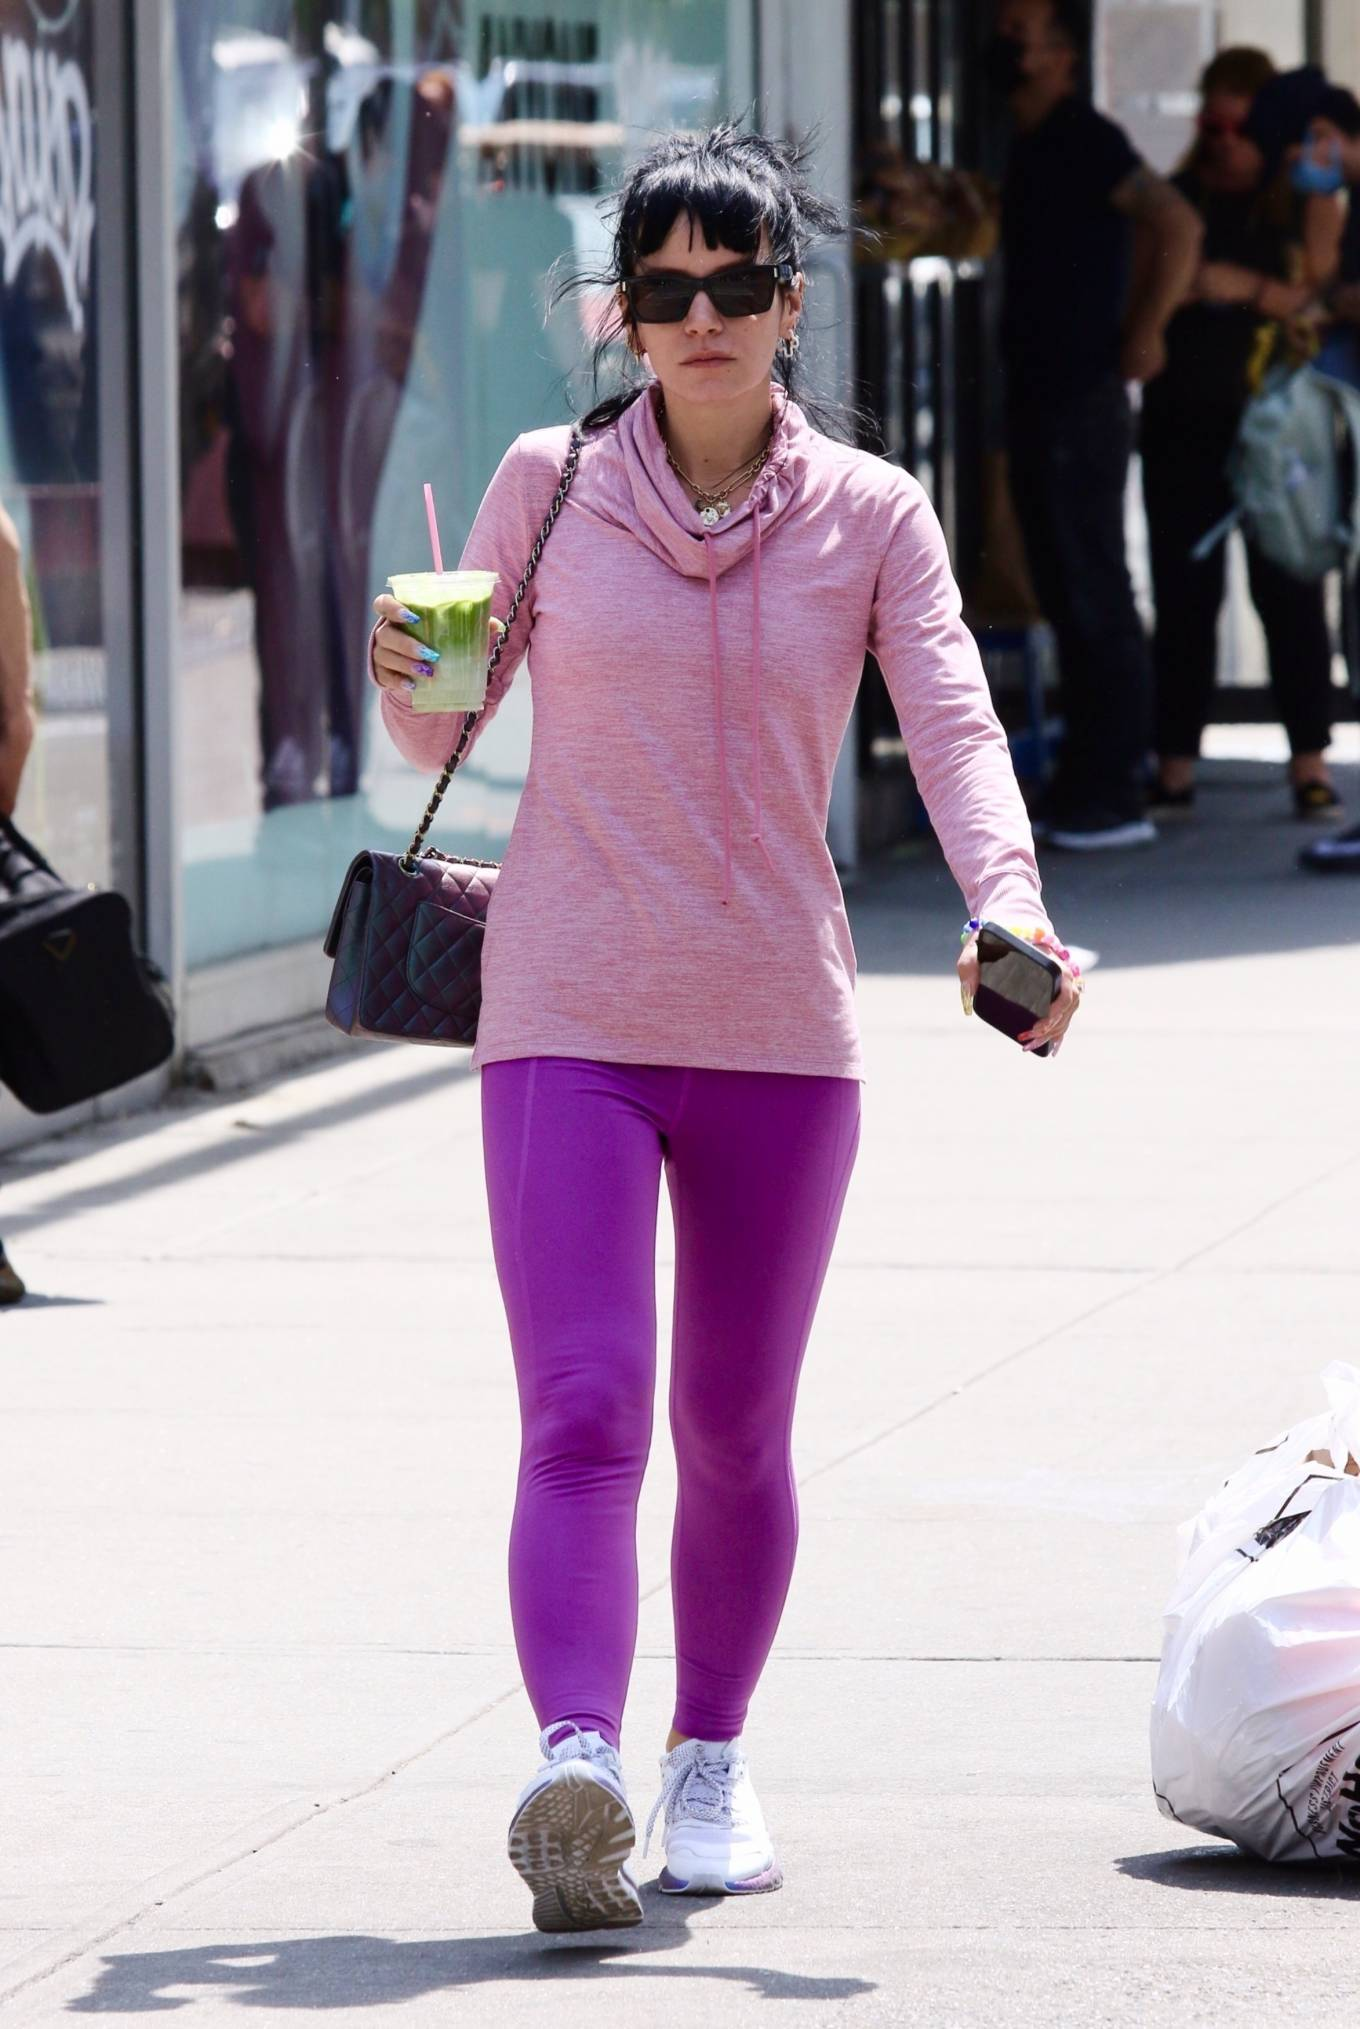 Lily Allen 2021 : Lily Allen – In a purple leggings out in Manhattan's Soho area-12